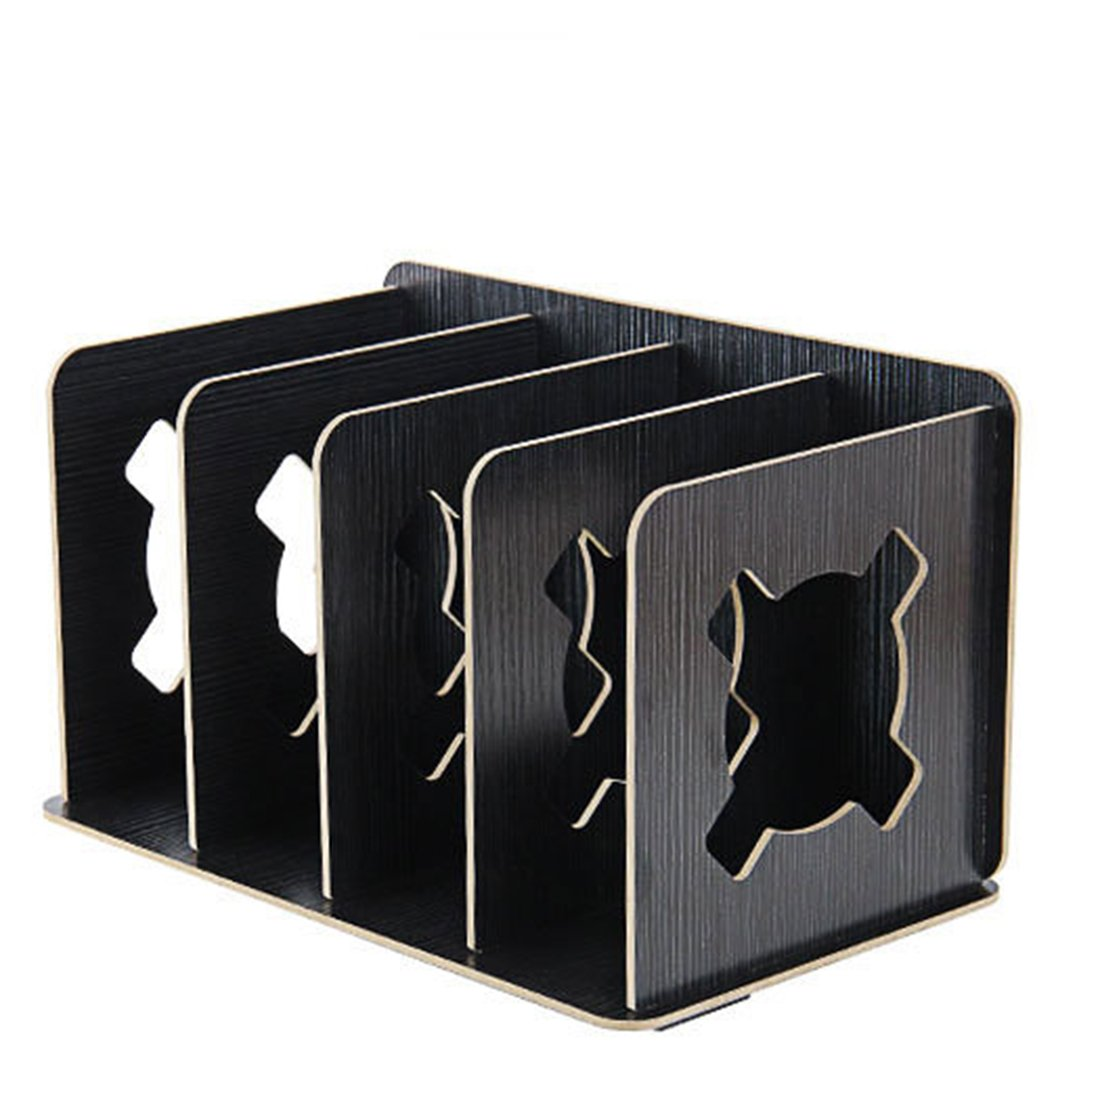 iTECHOR Creative Student Book Clip Shelf Durable Files Organizer Stand Frame - Silver Black